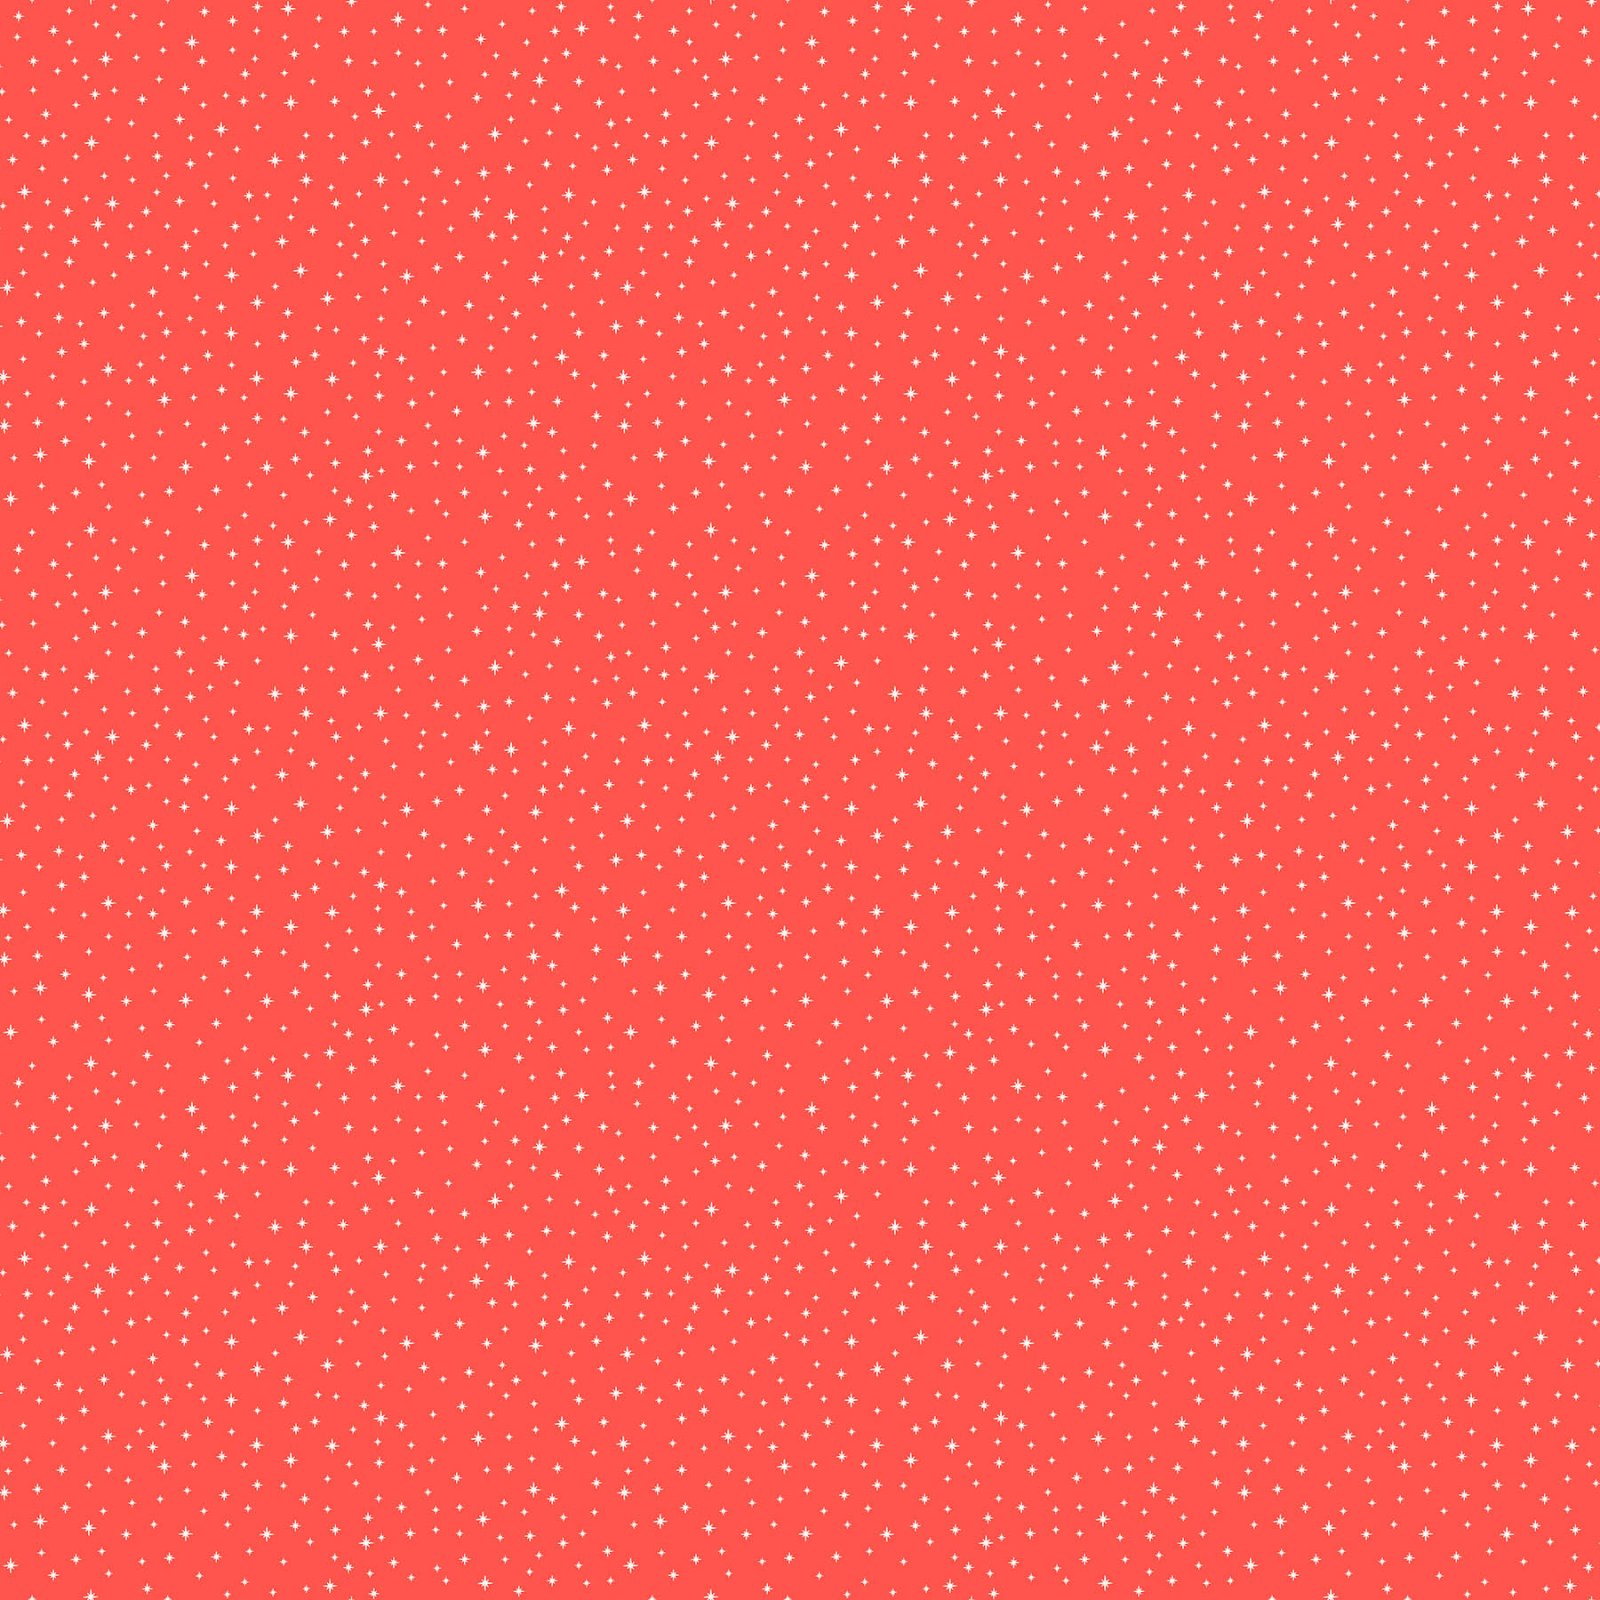 FIGO, Peppermint - Stars Red